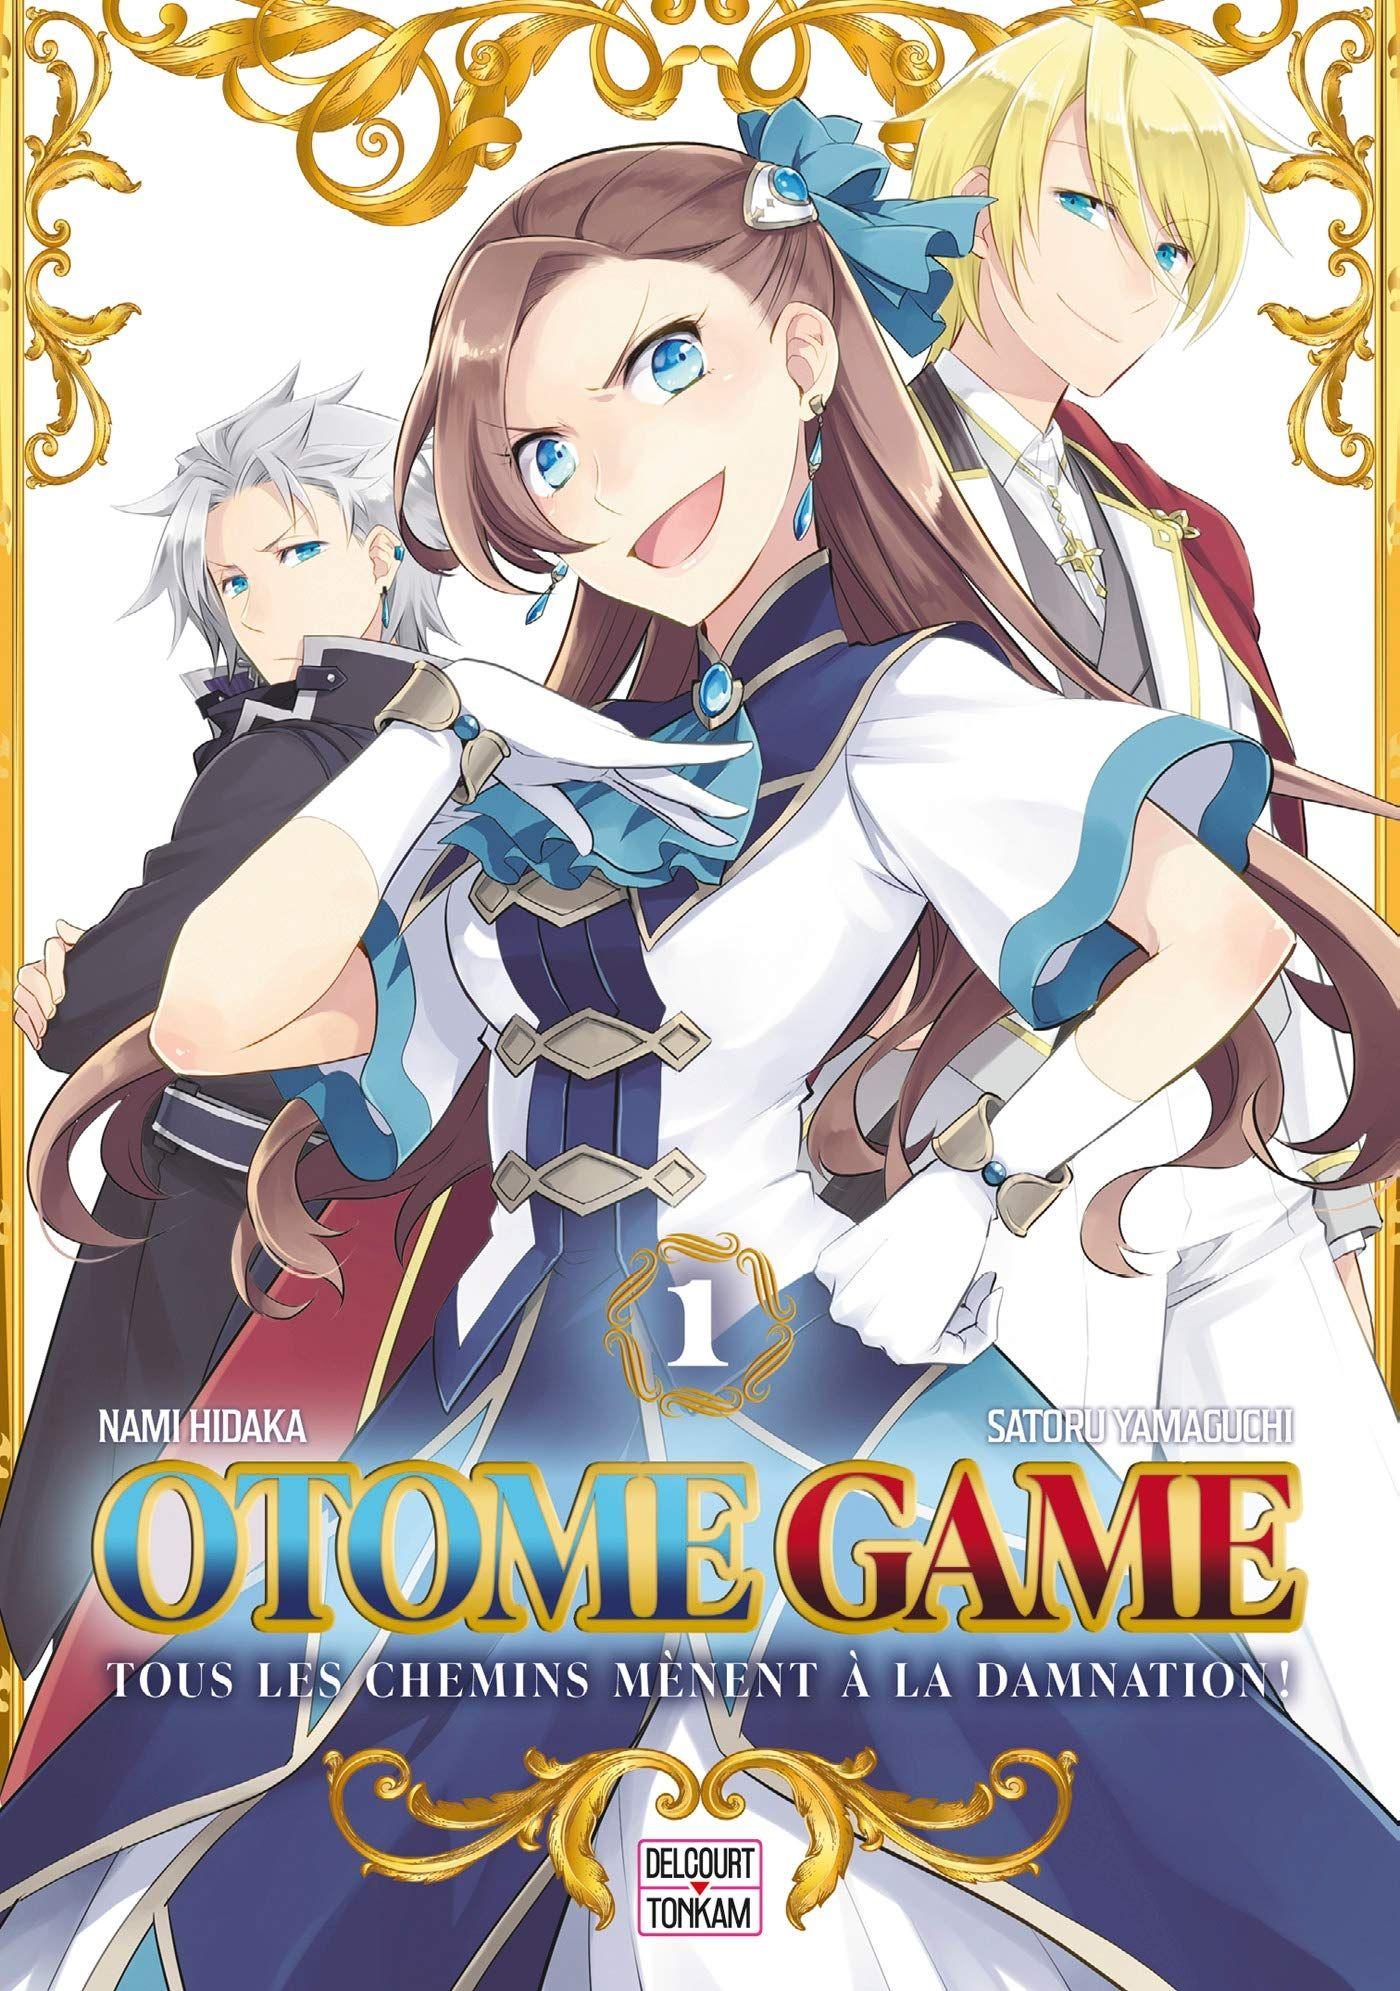 Sortie Manga au Québec JUIN 2021 Otome-game-1-delcourt